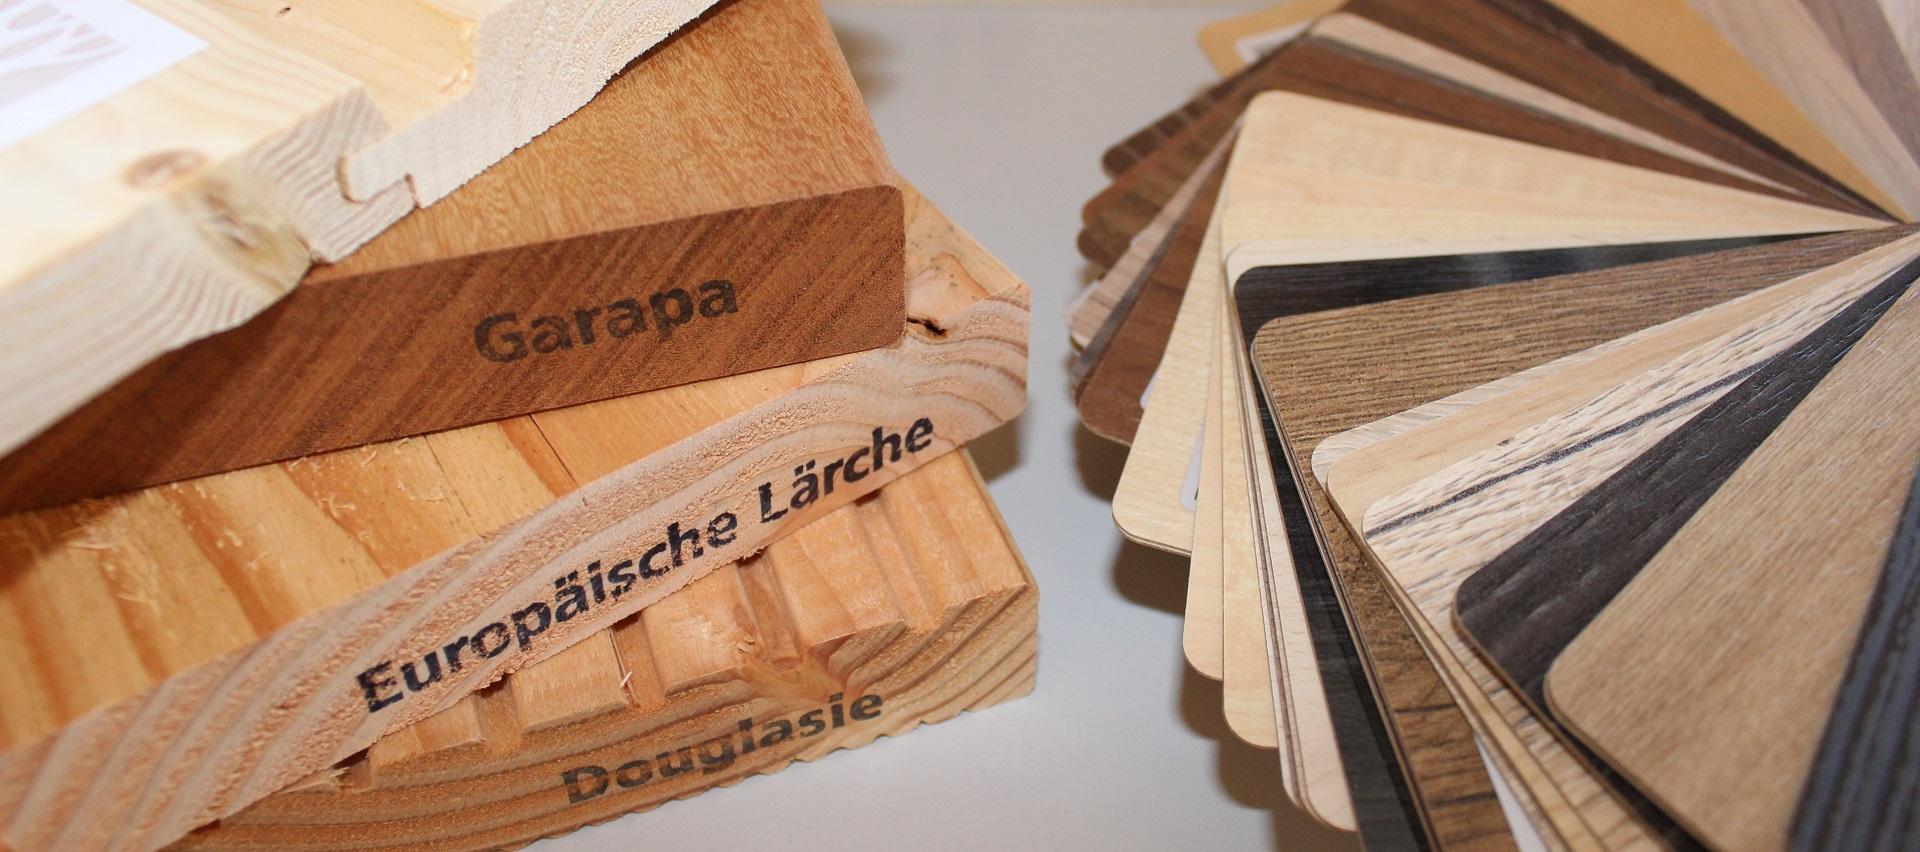 Service Holz Hauff